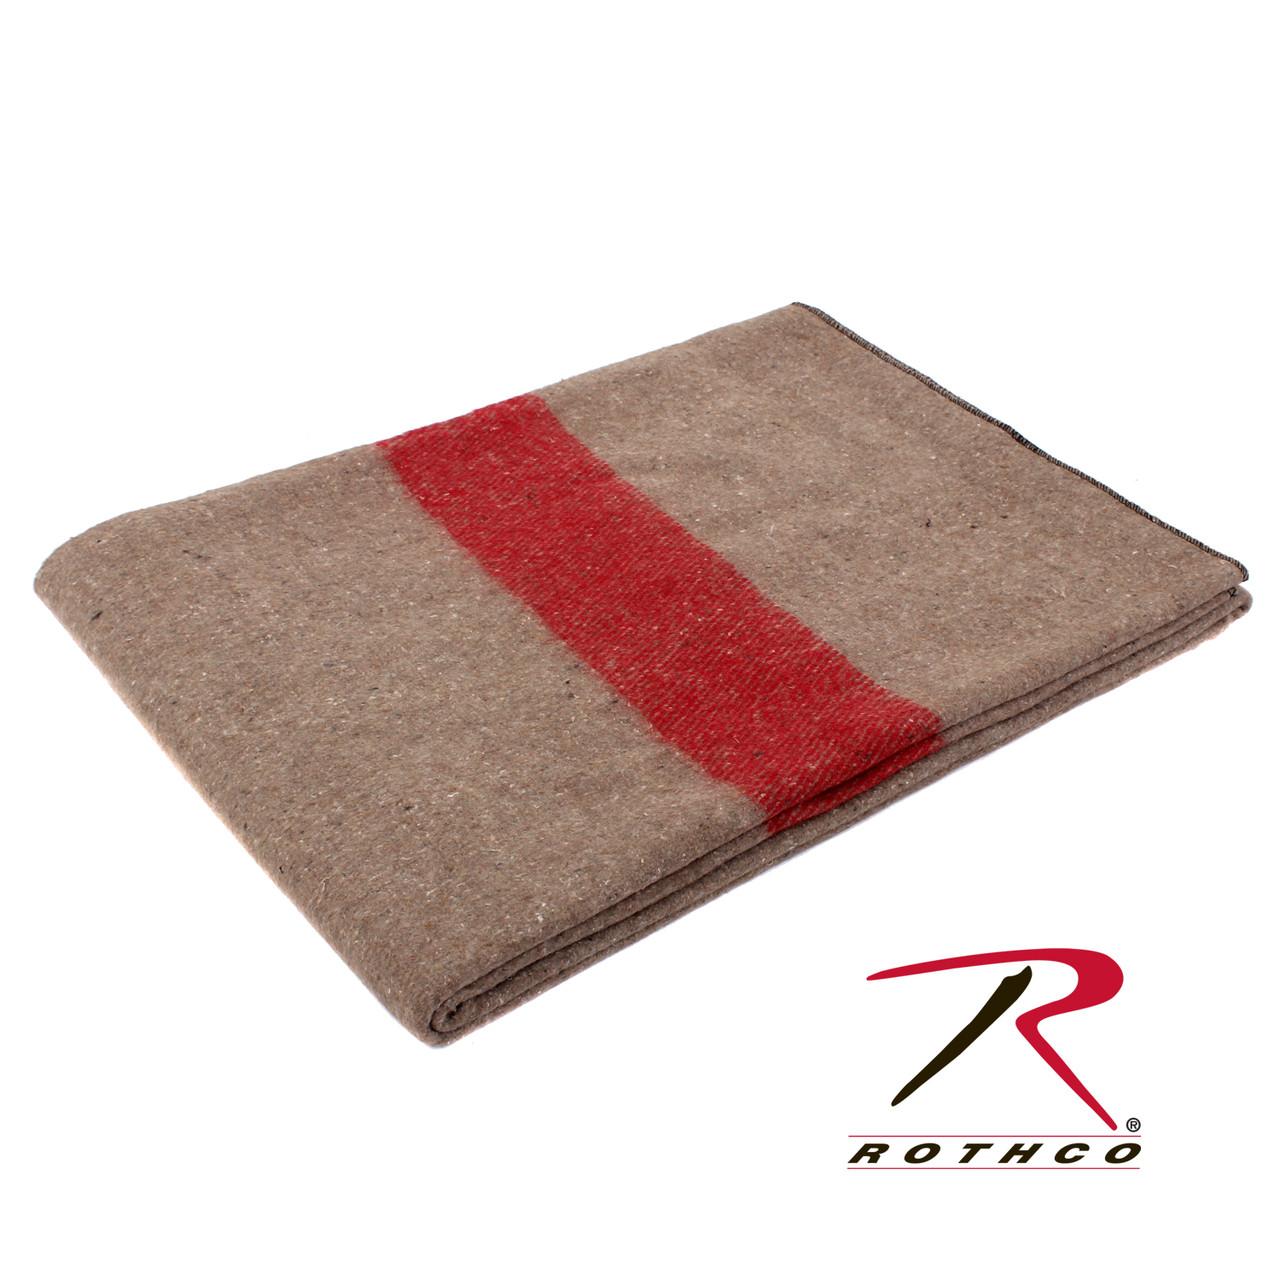 Rothco Swiss Style Wool Blanket